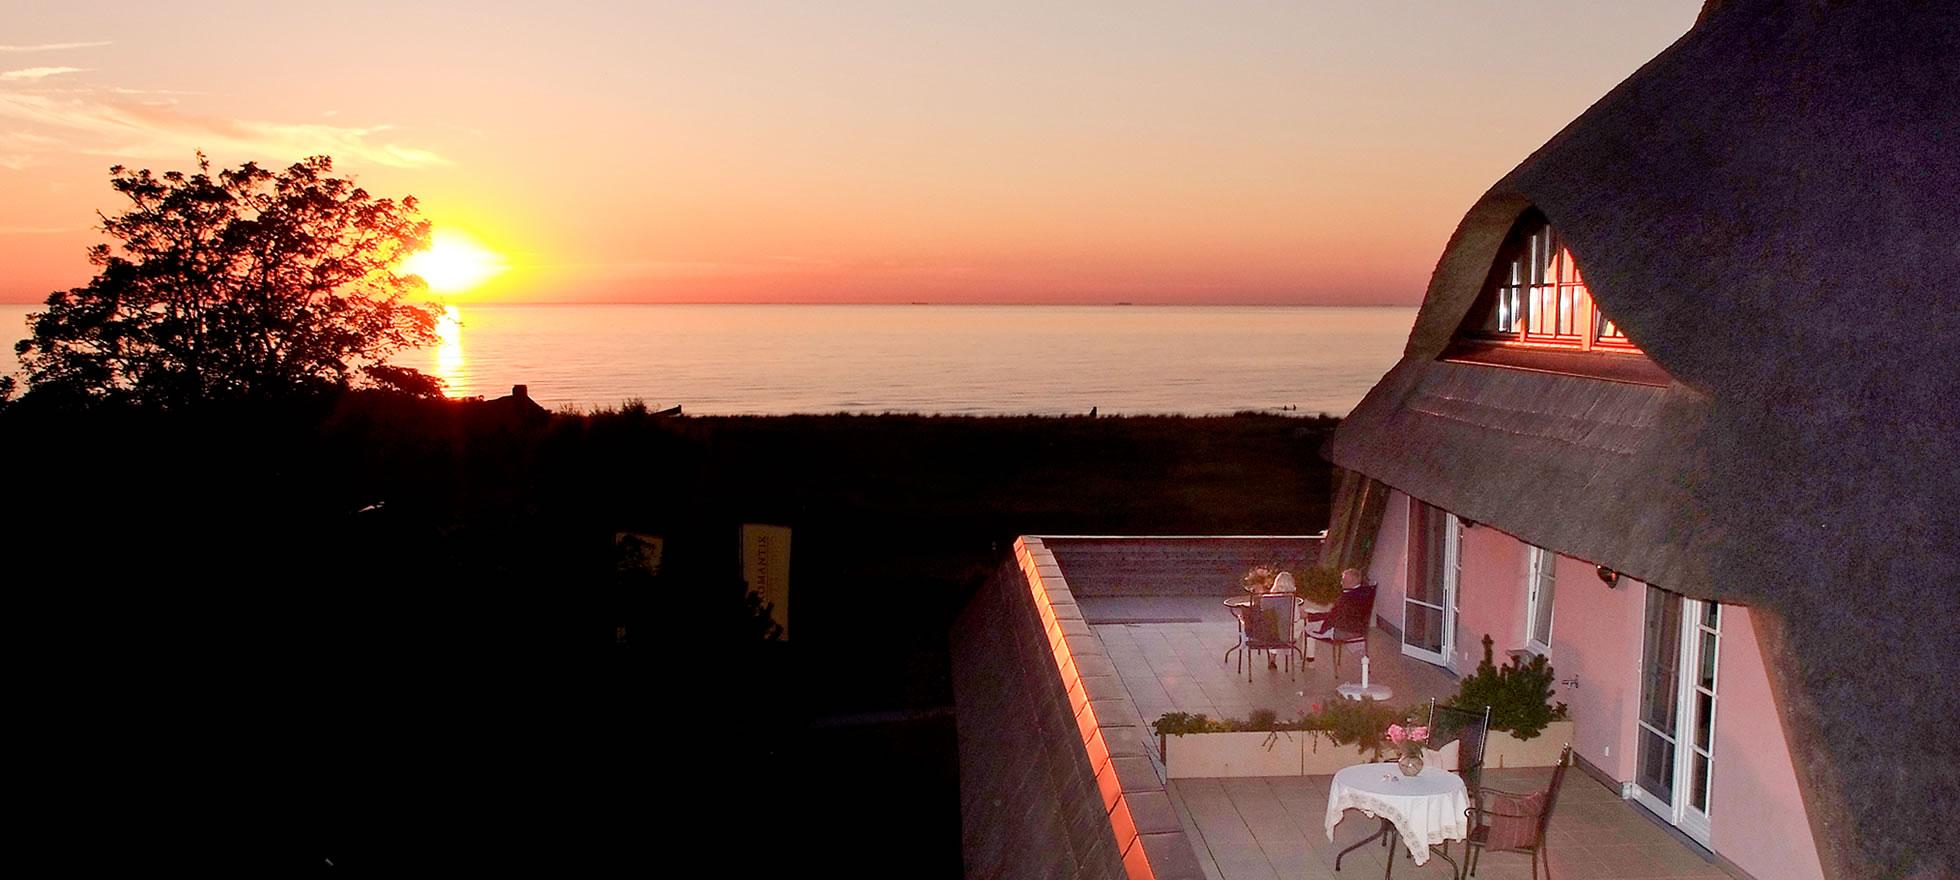 Hotel Namenlos, Balkon mit Meerblick